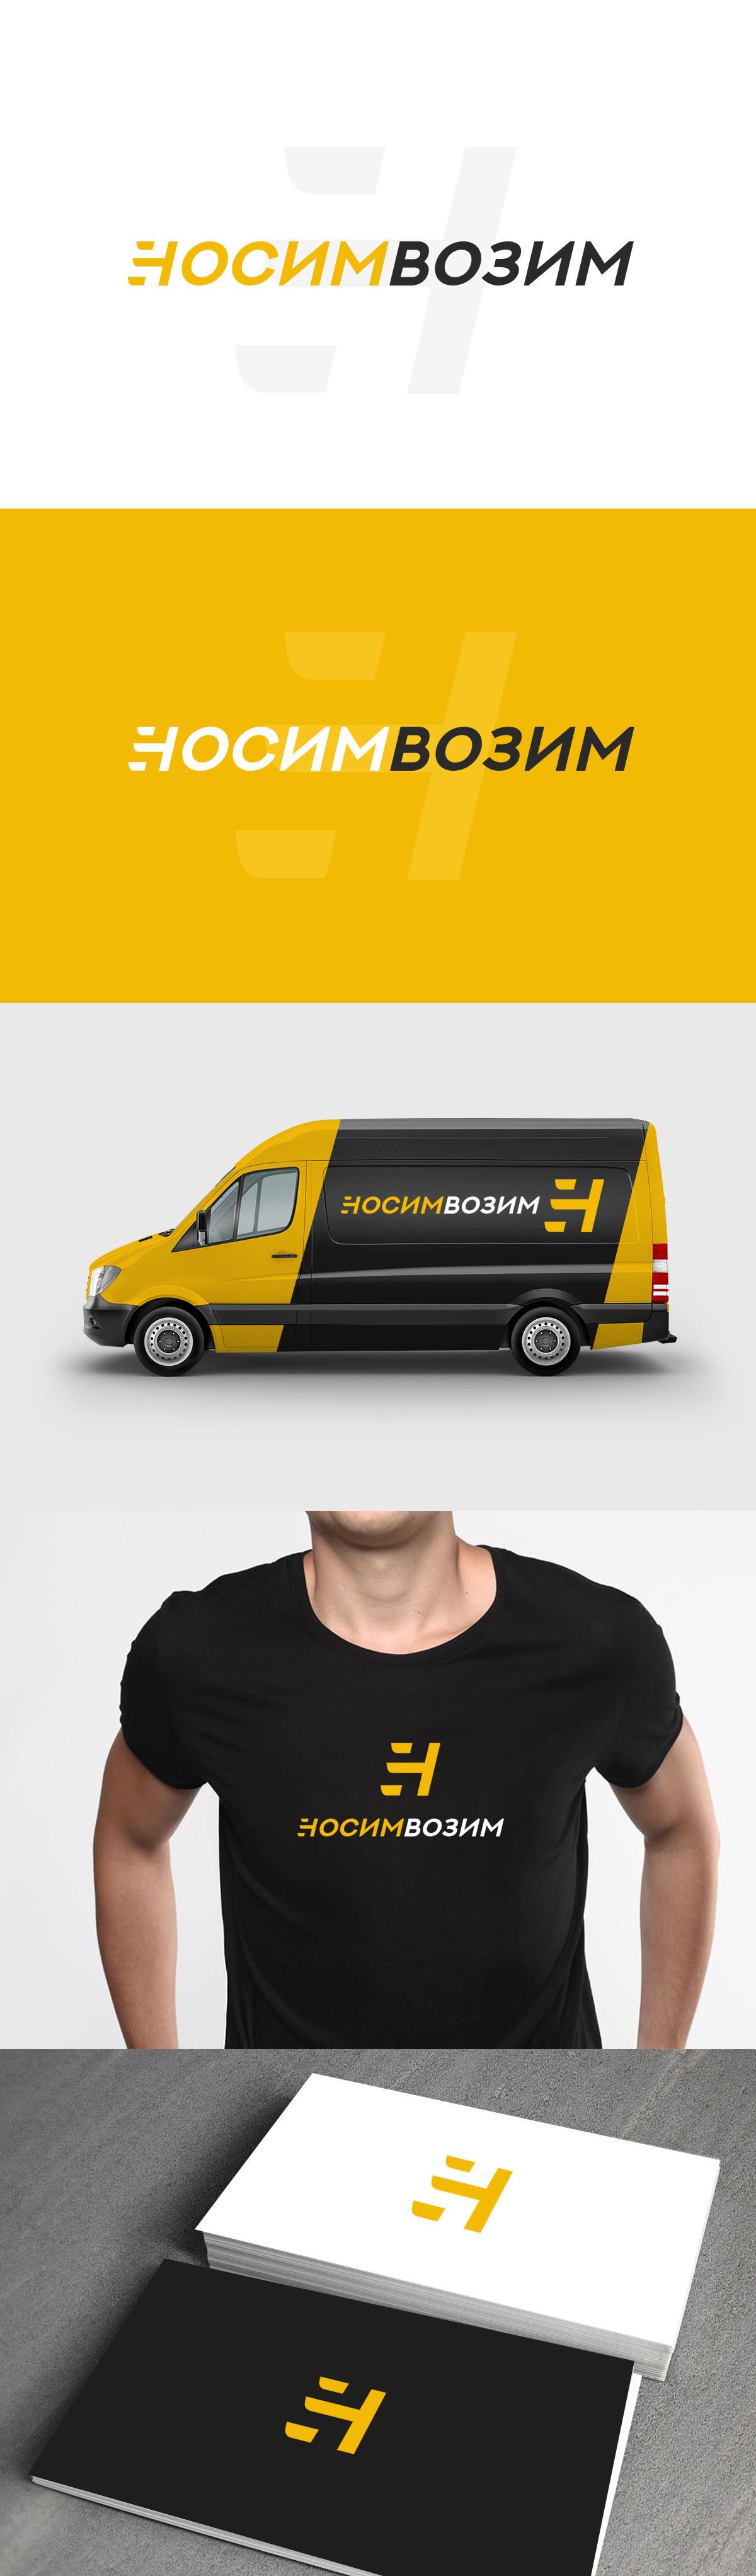 Логотип компании по перевозкам НосимВозим фото f_5065cf91145ca490.jpg